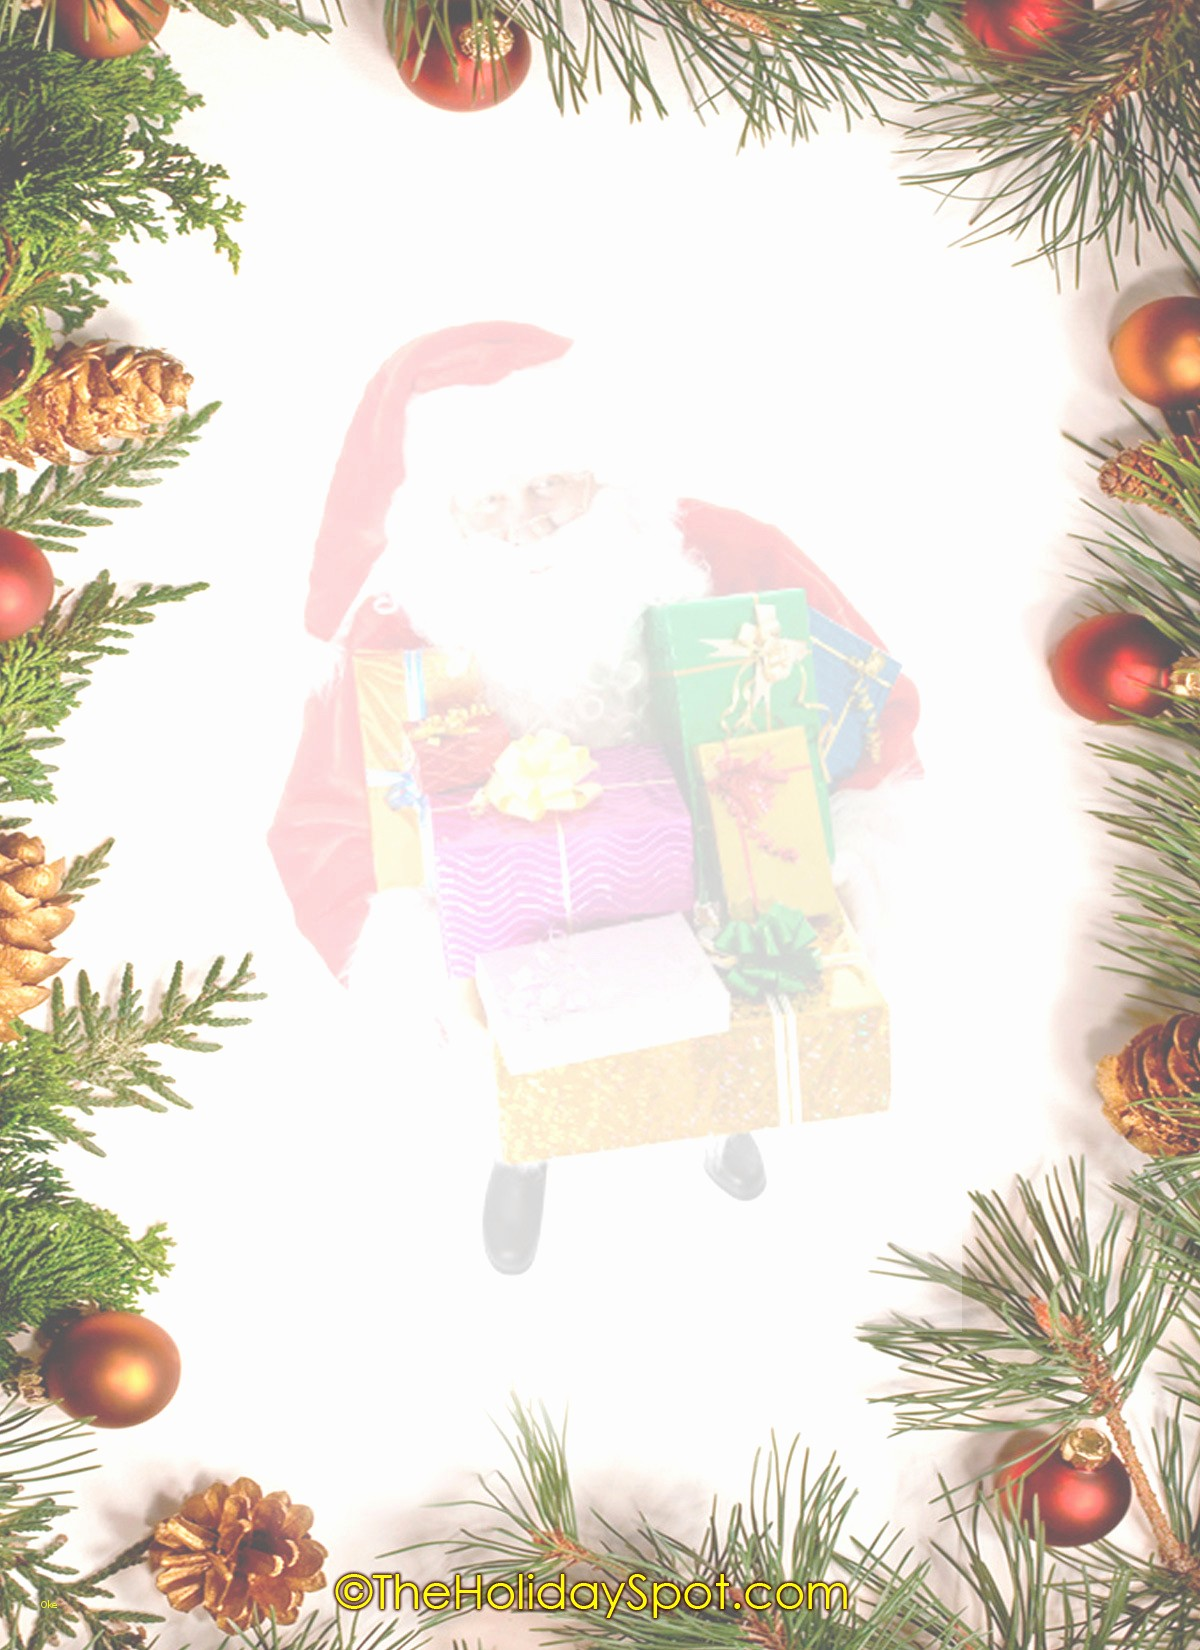 Free Printable Christmas Stationery Templates Beautiful Awesome Free Holiday Stationery Templates